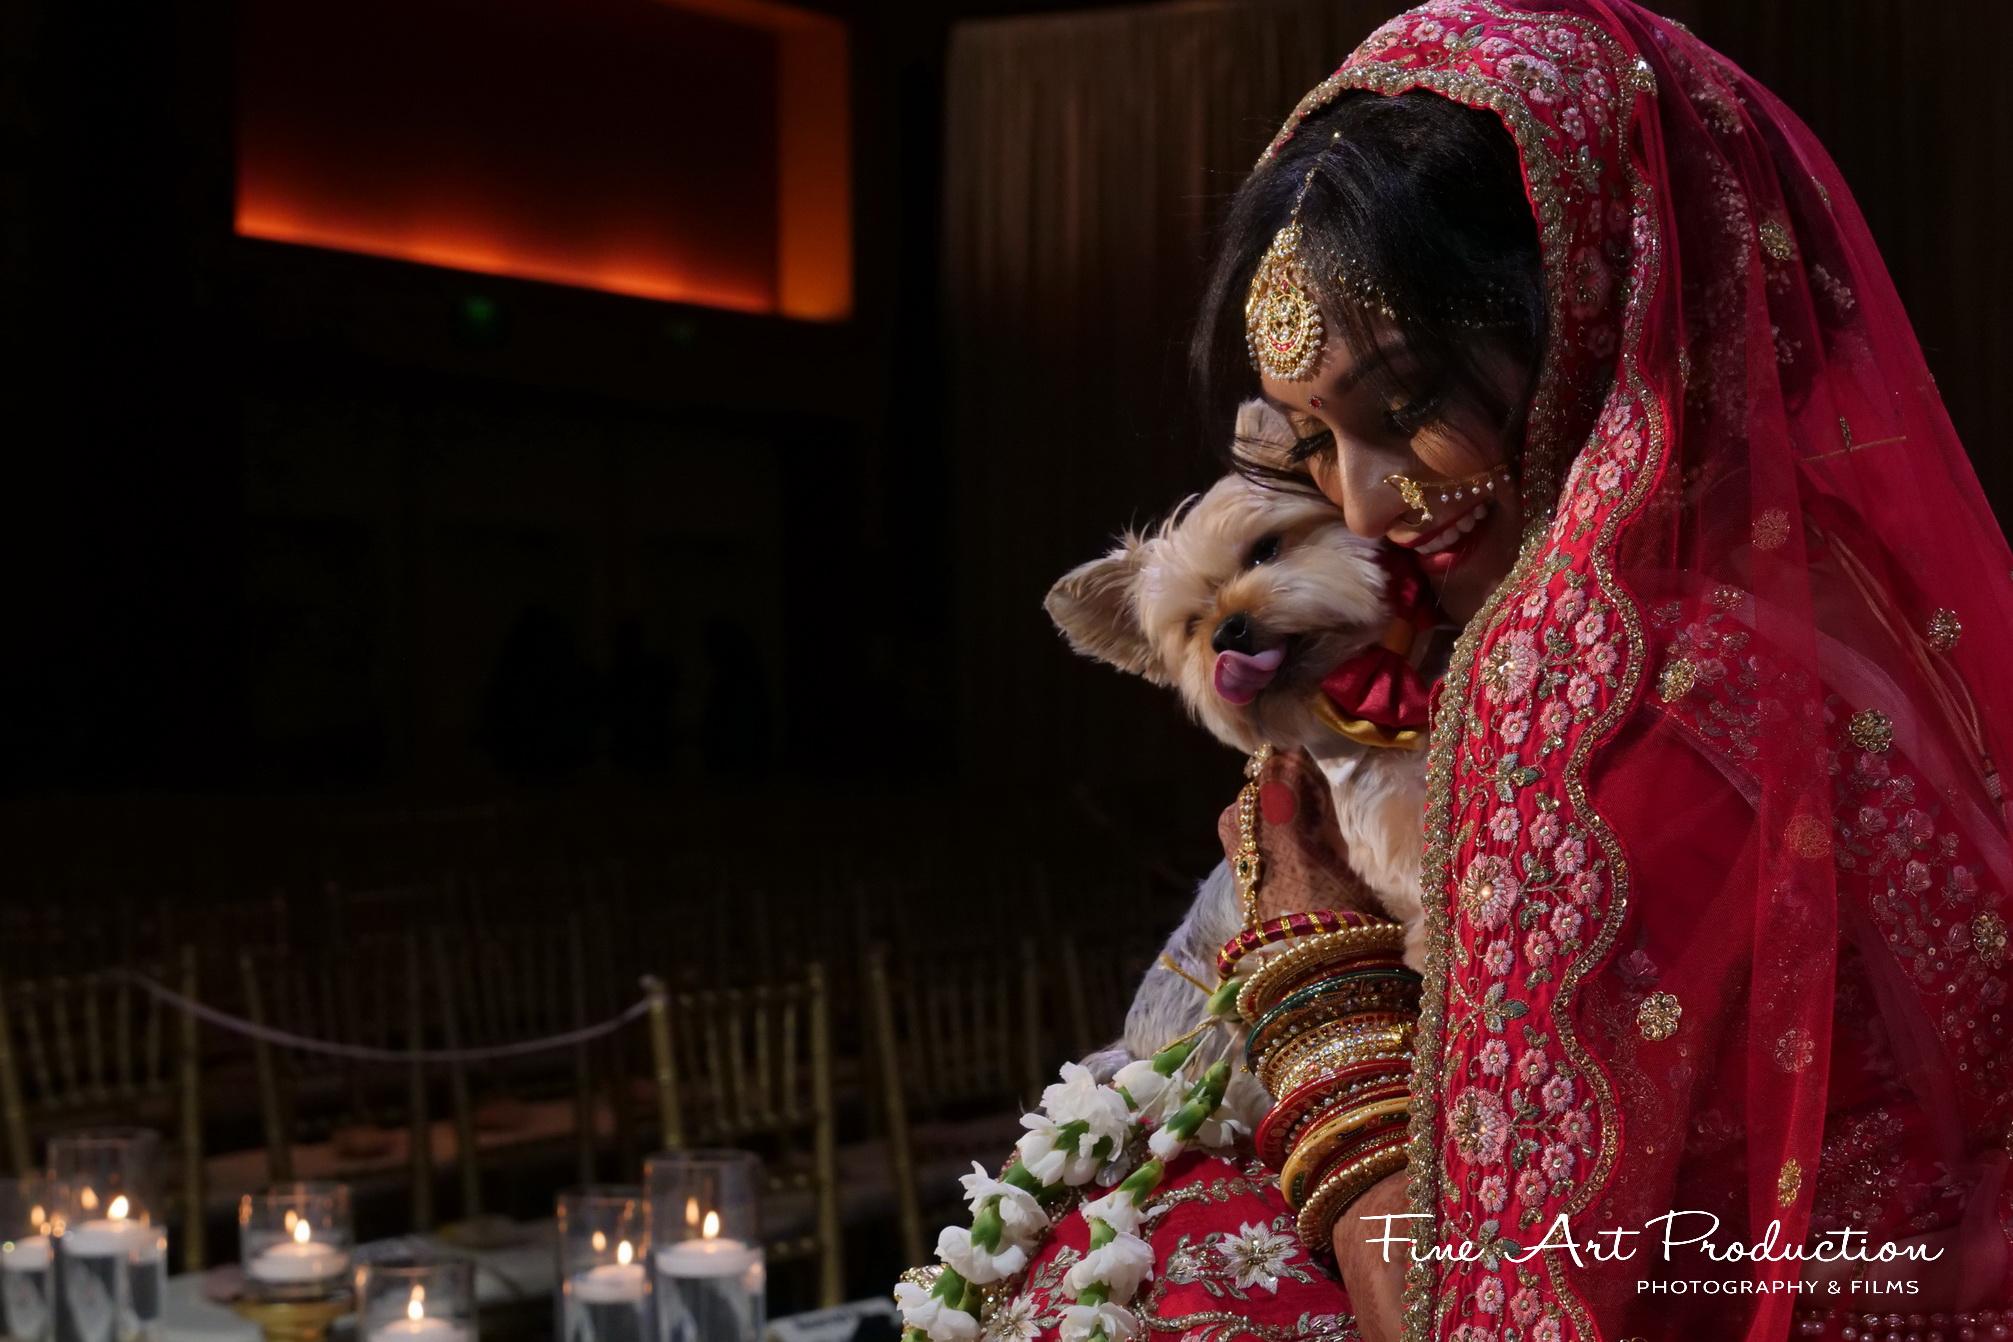 Indian Wedding Bridal Portrait Photography